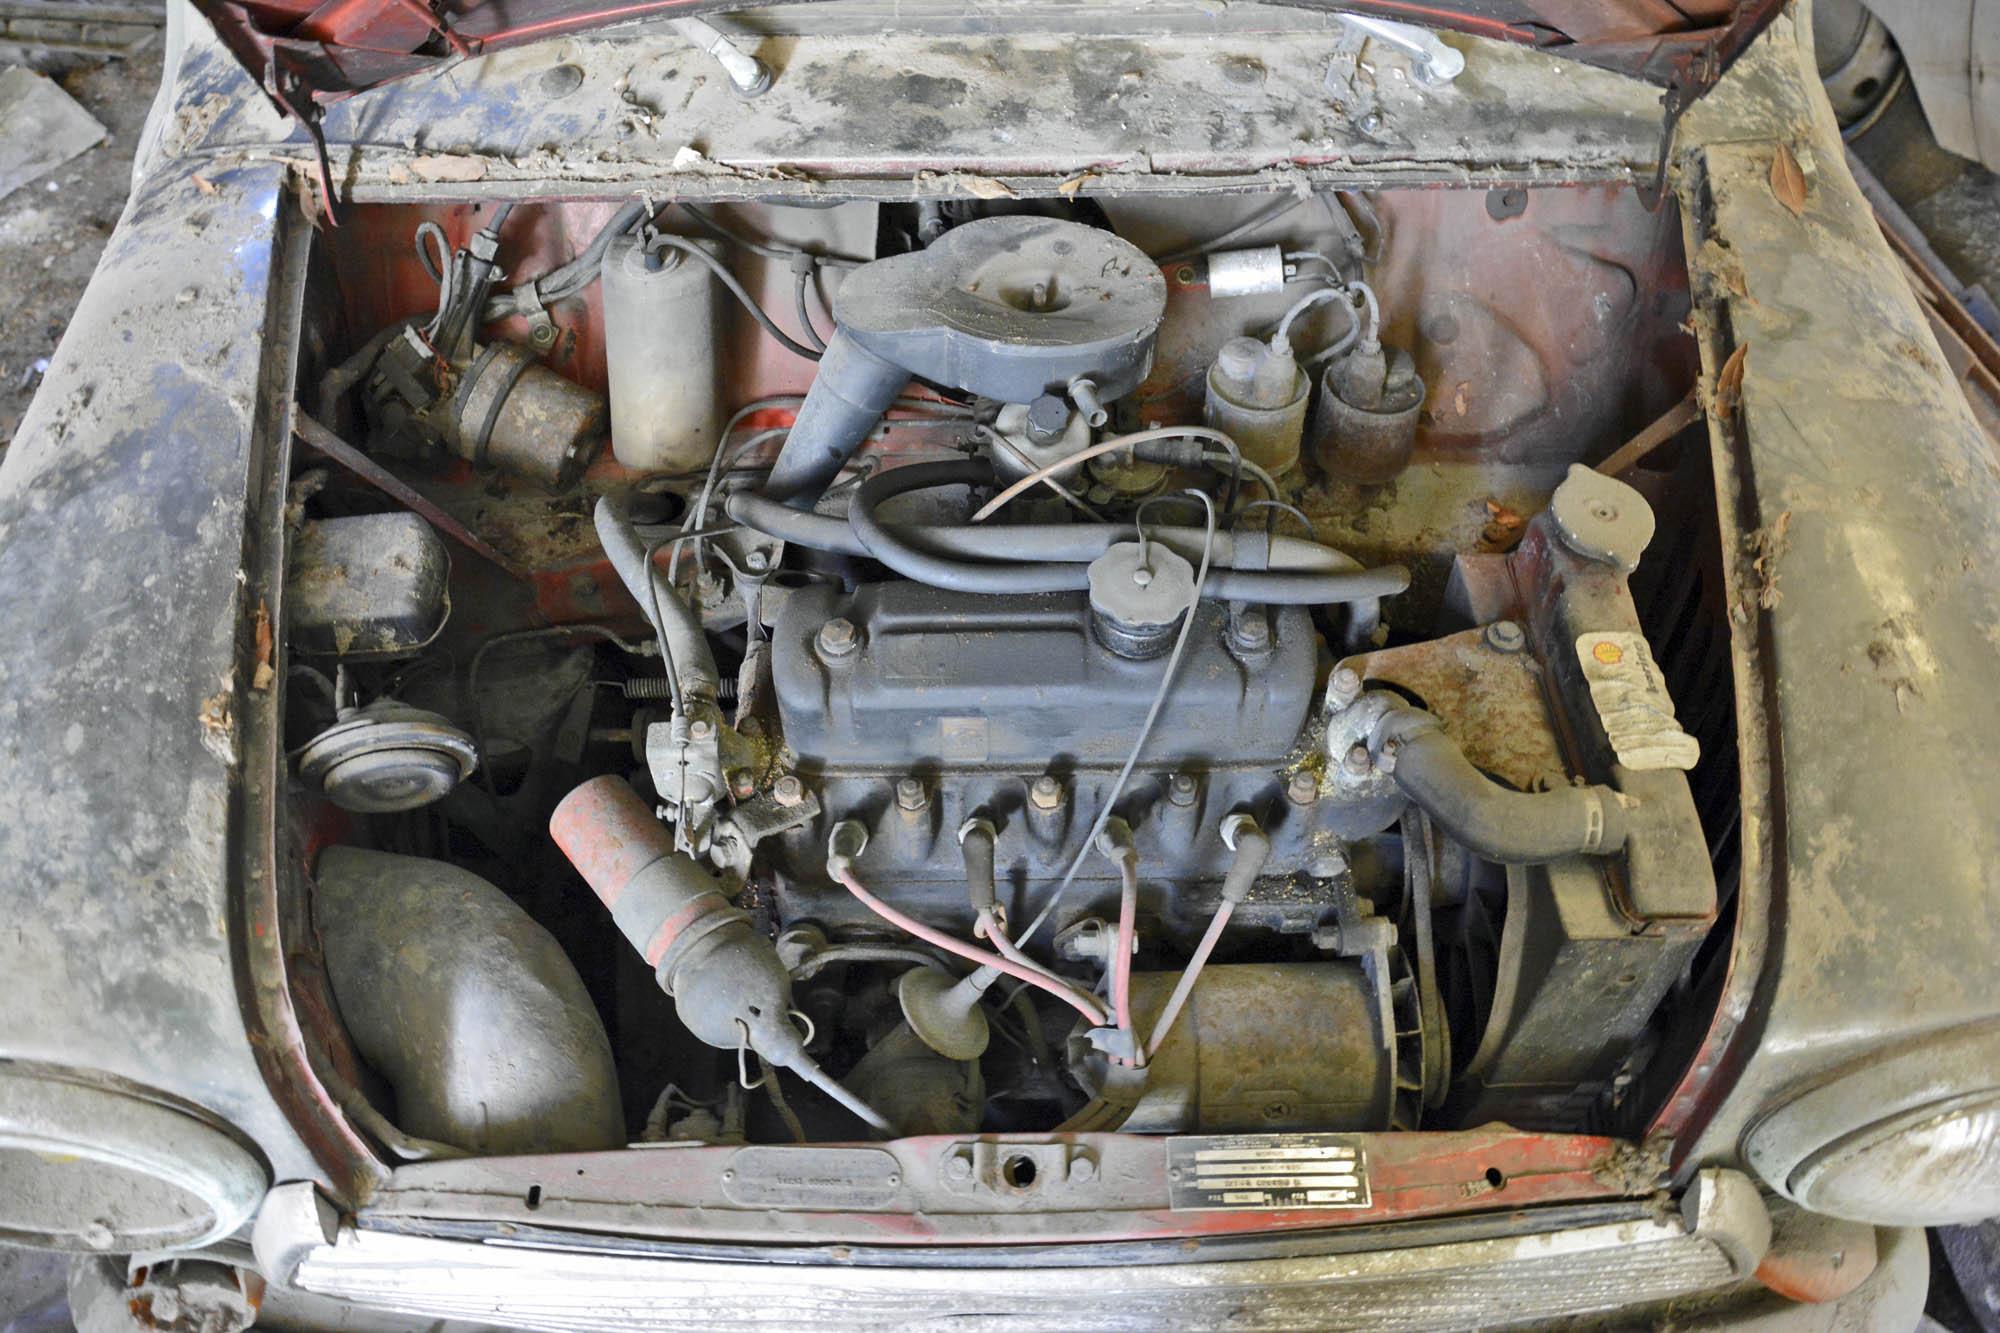 1972 Mini engine